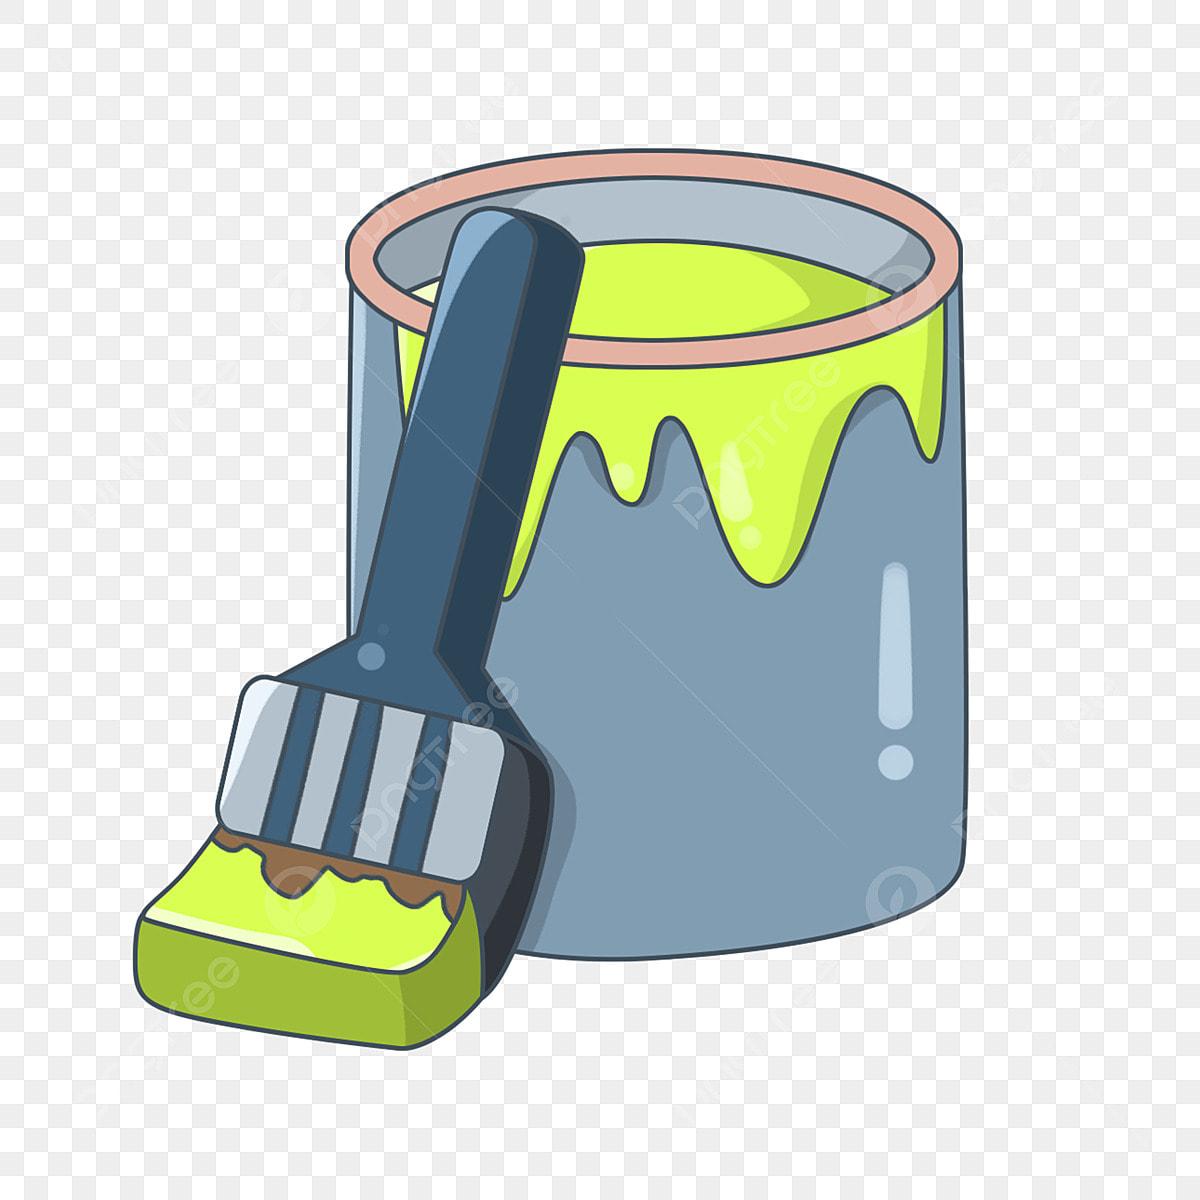 Green Paint Paint Bucket Illustration Paint Brush Construction Tools Cartoon Cartoon Paint Bucket Green Paint Imagem Png E Psd Para Download Gratuito